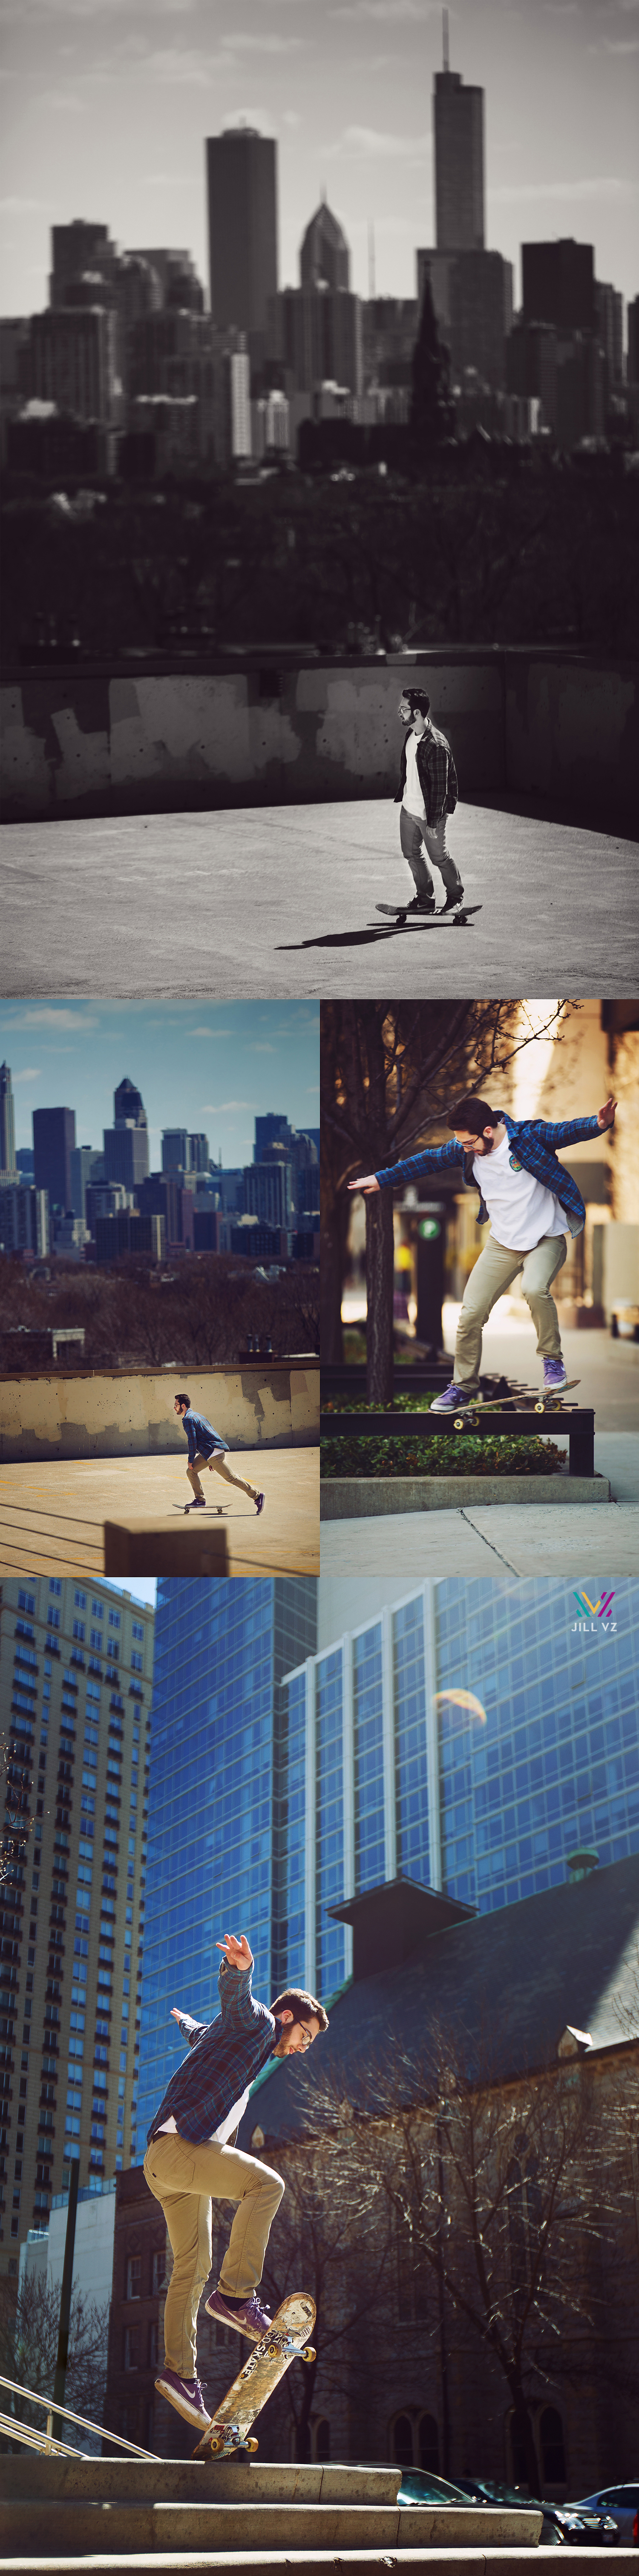 skateboarder photos downtown